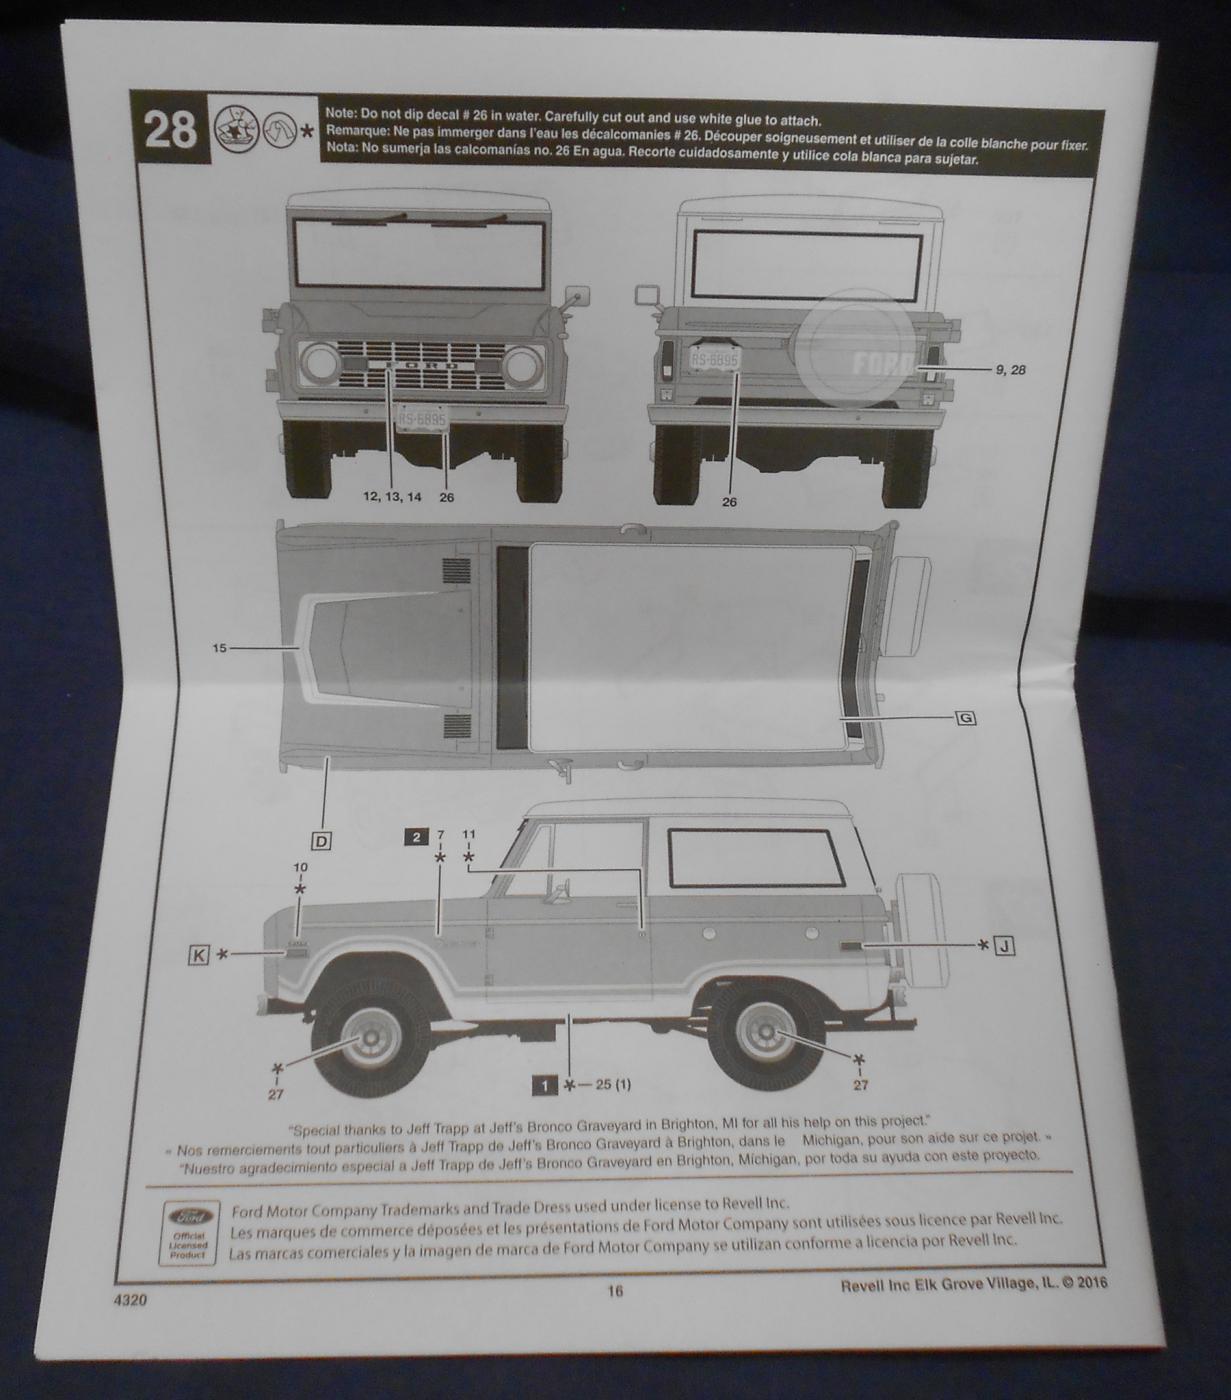 Revell 1971 73 Ford Bronco Truck Kit News Reviews Model Cars Pole Barn Build Page 7 Forum Dscn9415